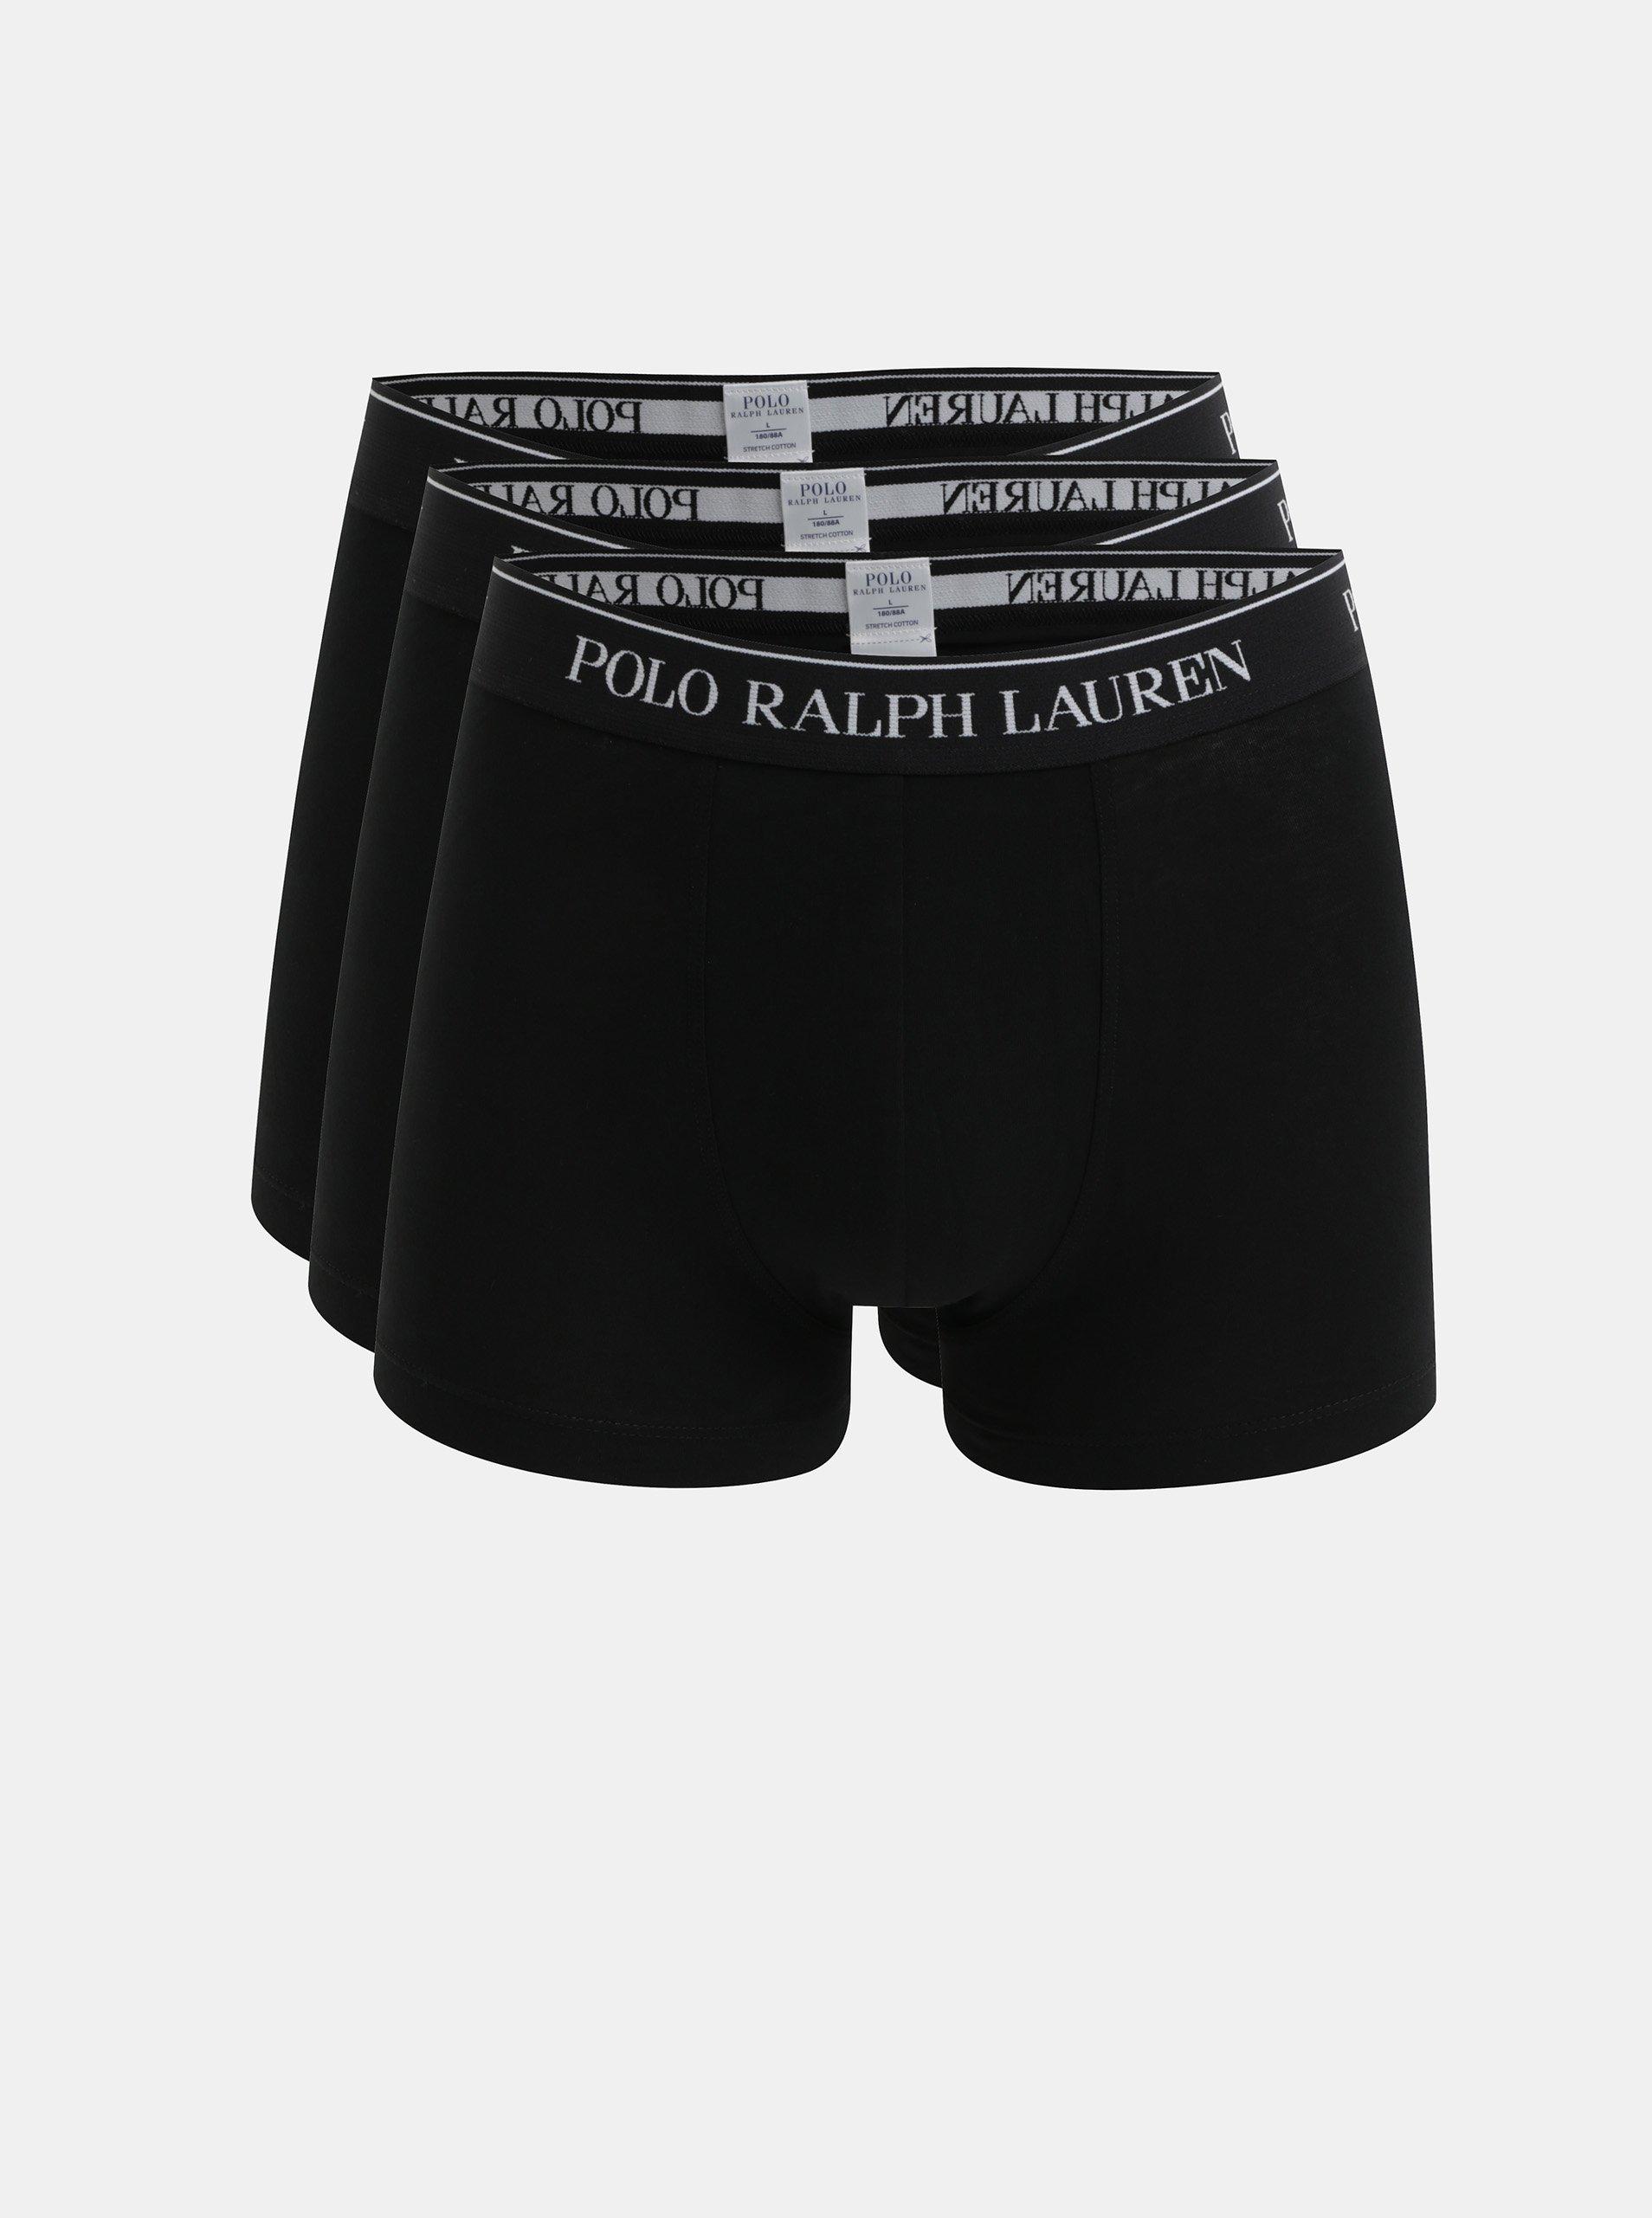 Sada tří boxerek v černé barvě POLO Ralph Lauren